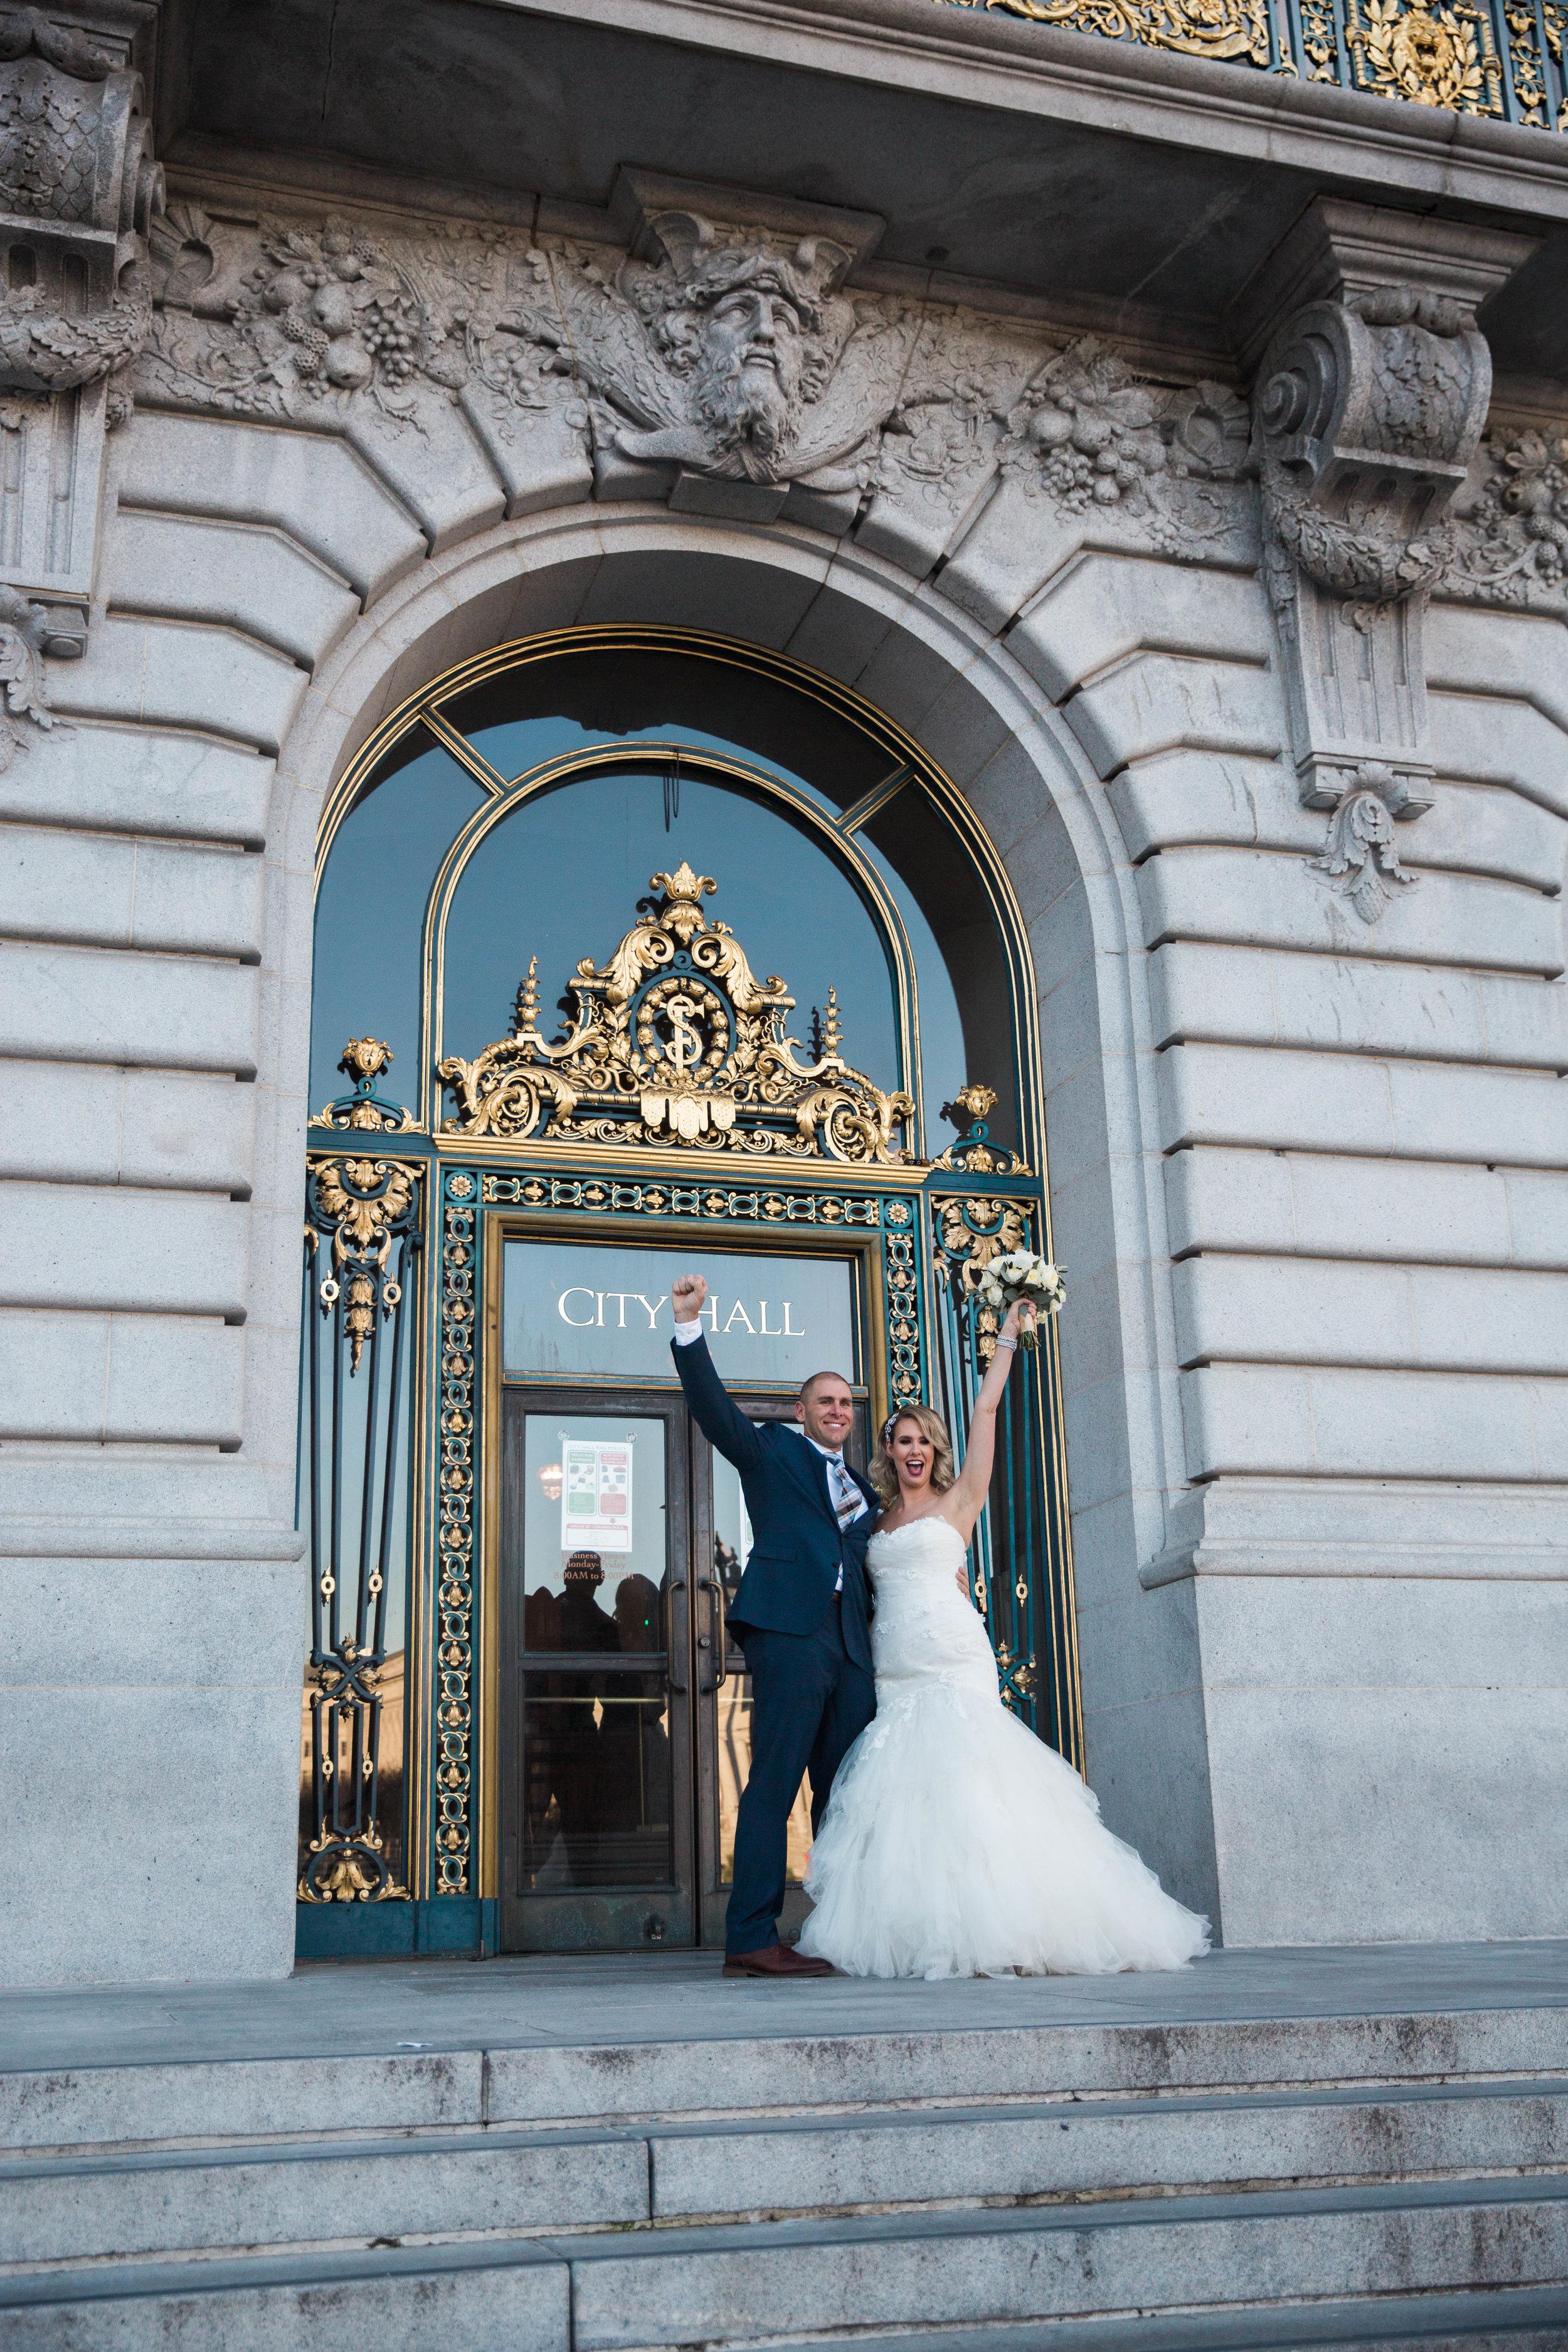 san-francisco-city-hall-wedding-kimberly-macdonald-photography747.jpg